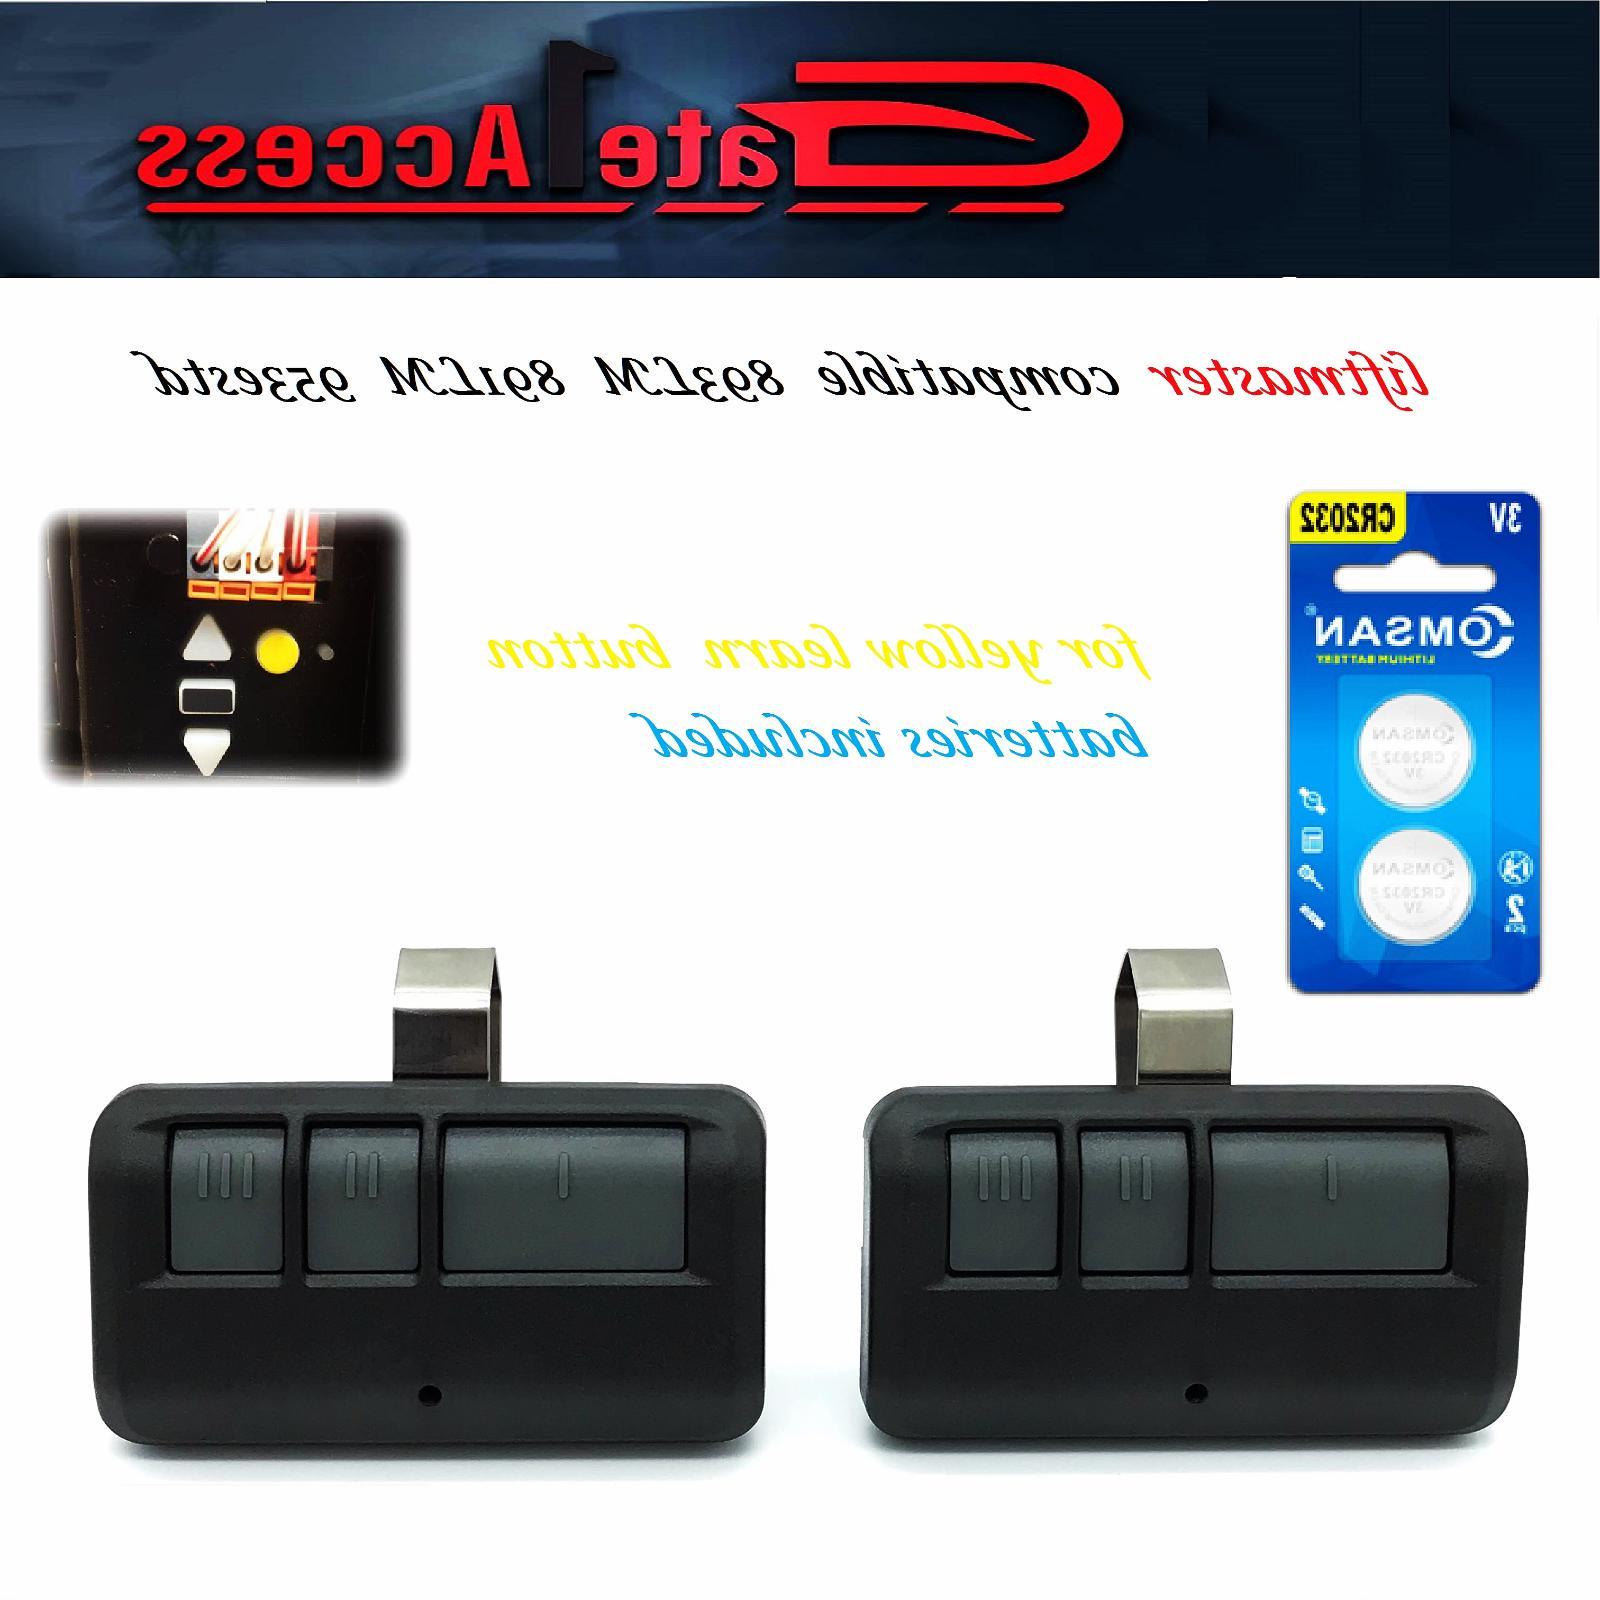 893lm comp remote control liftmaster 891lm 953estd